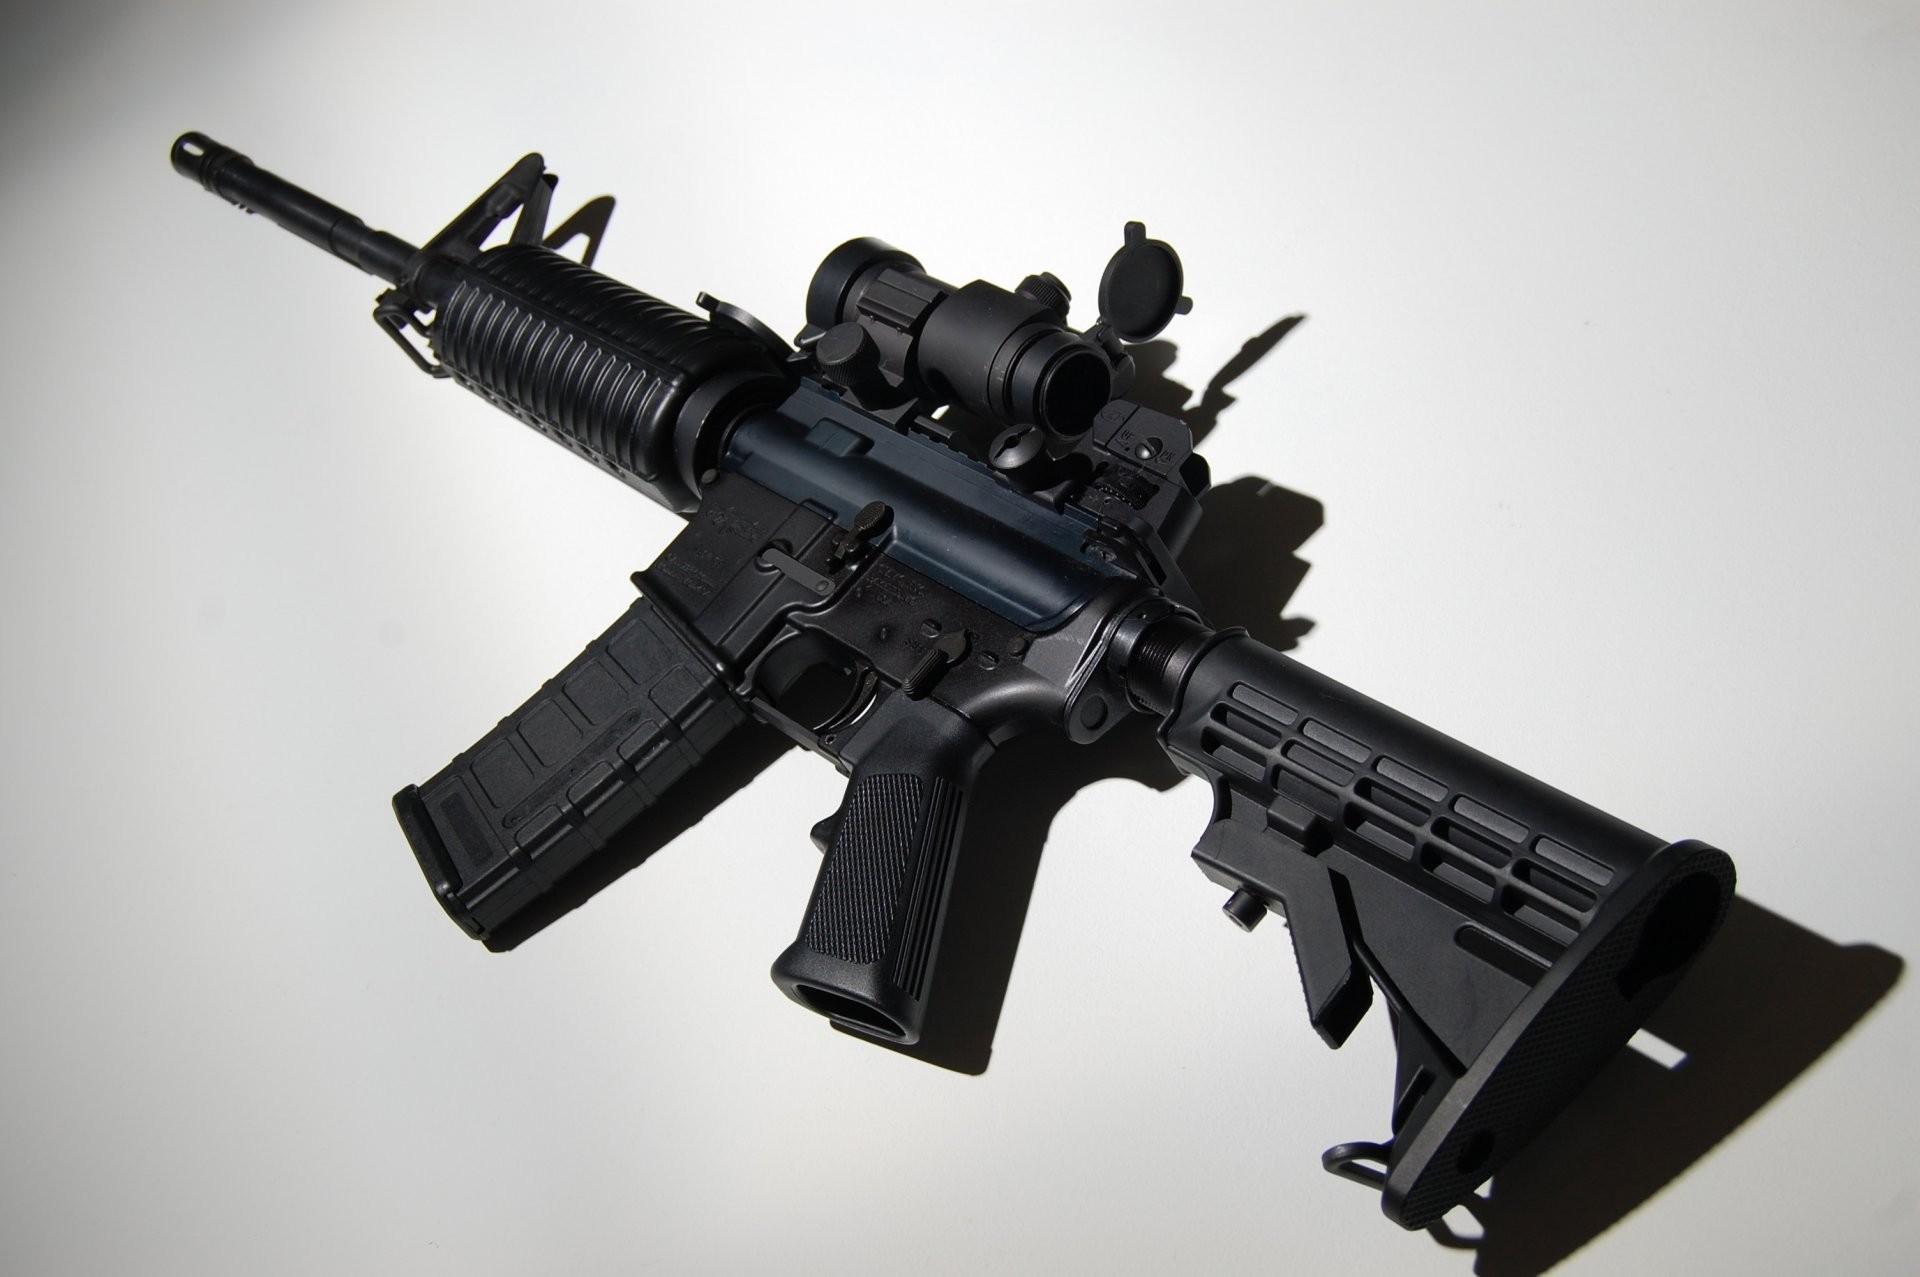 ar-15 assault rifle assault rifle machine weapon background